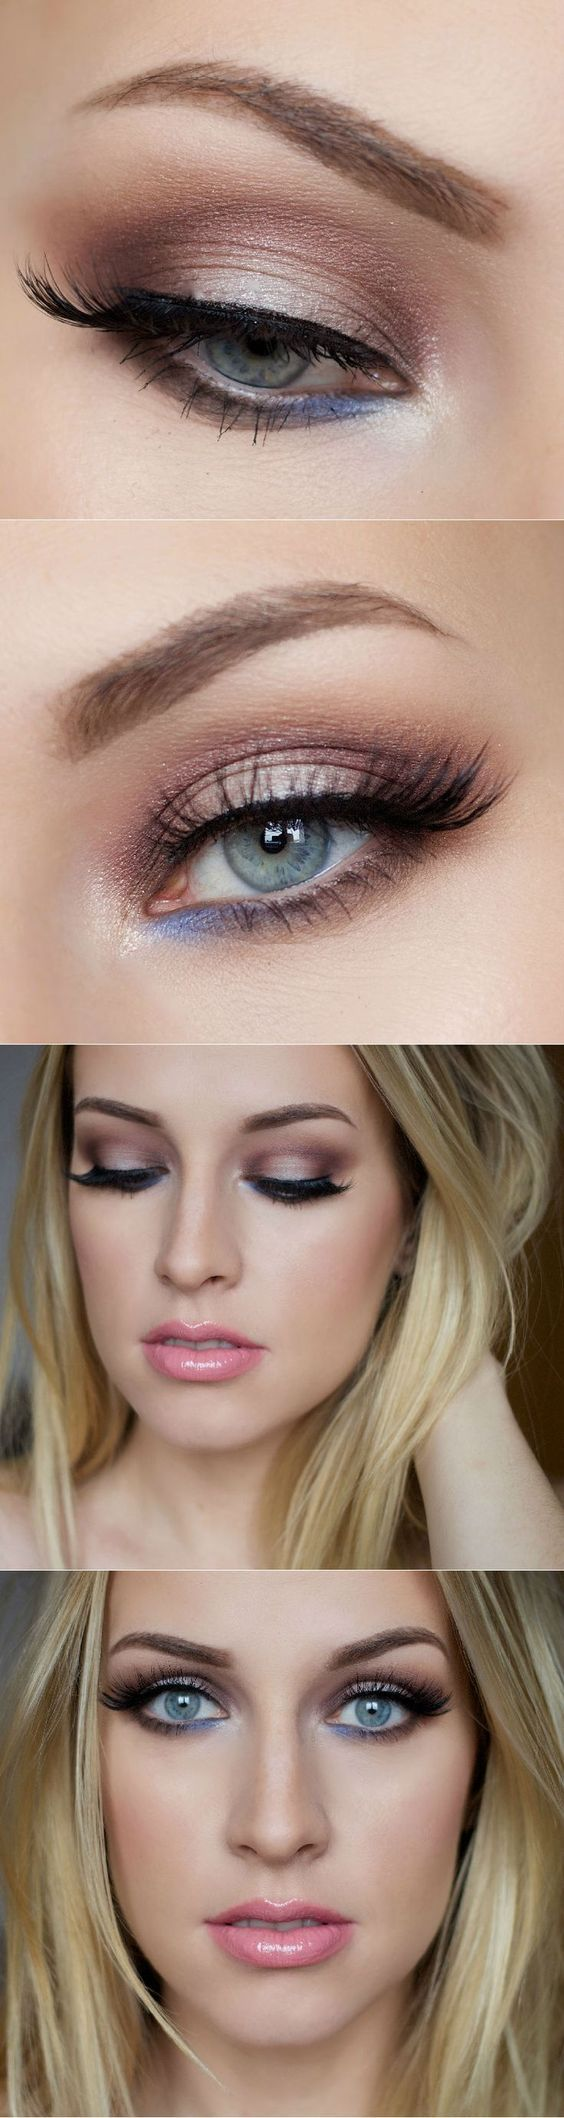 #Ojos #Sombras #Eyes